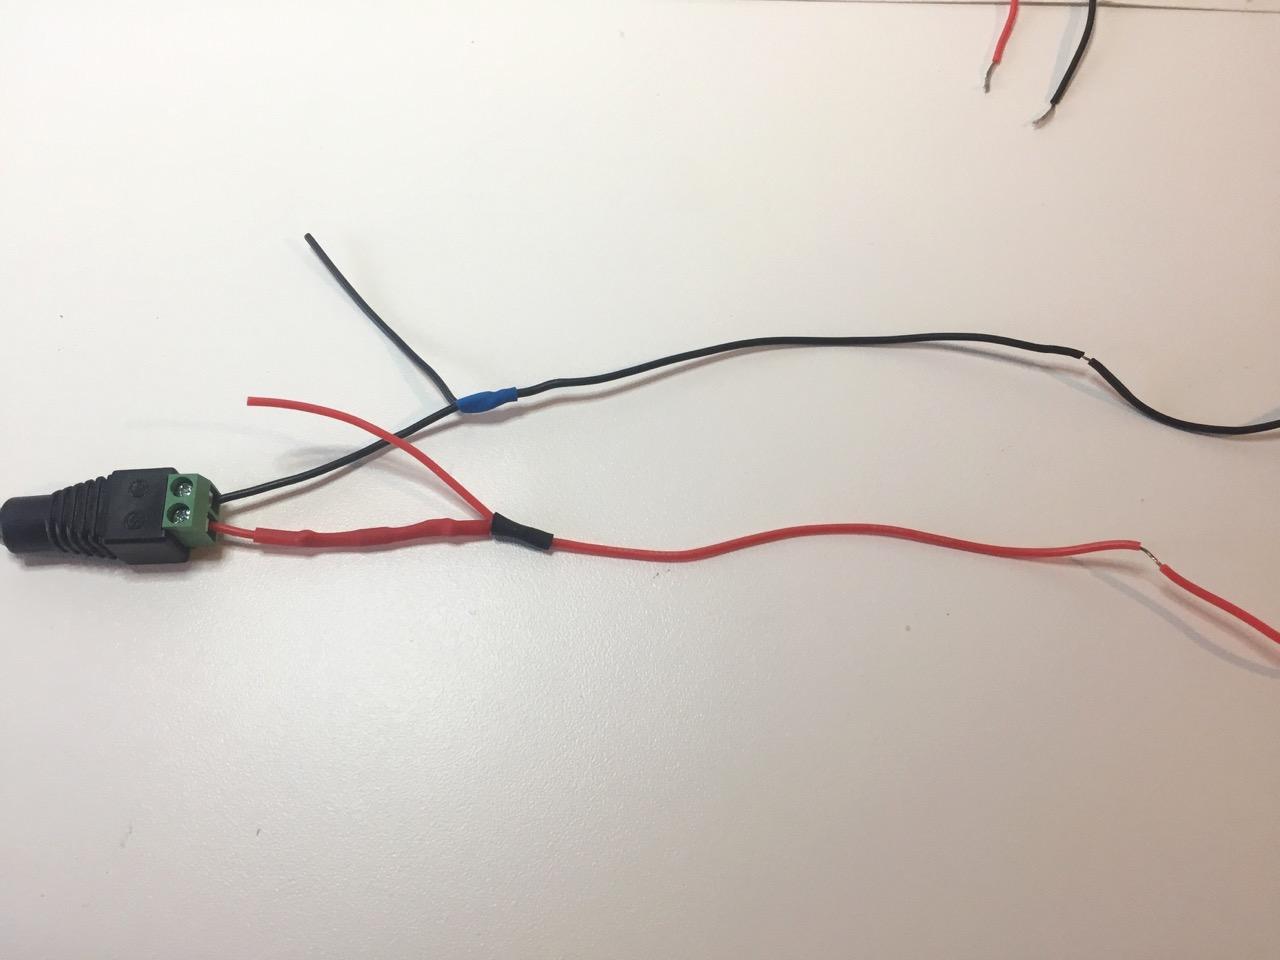 led_strips_09_solderwires.jpg